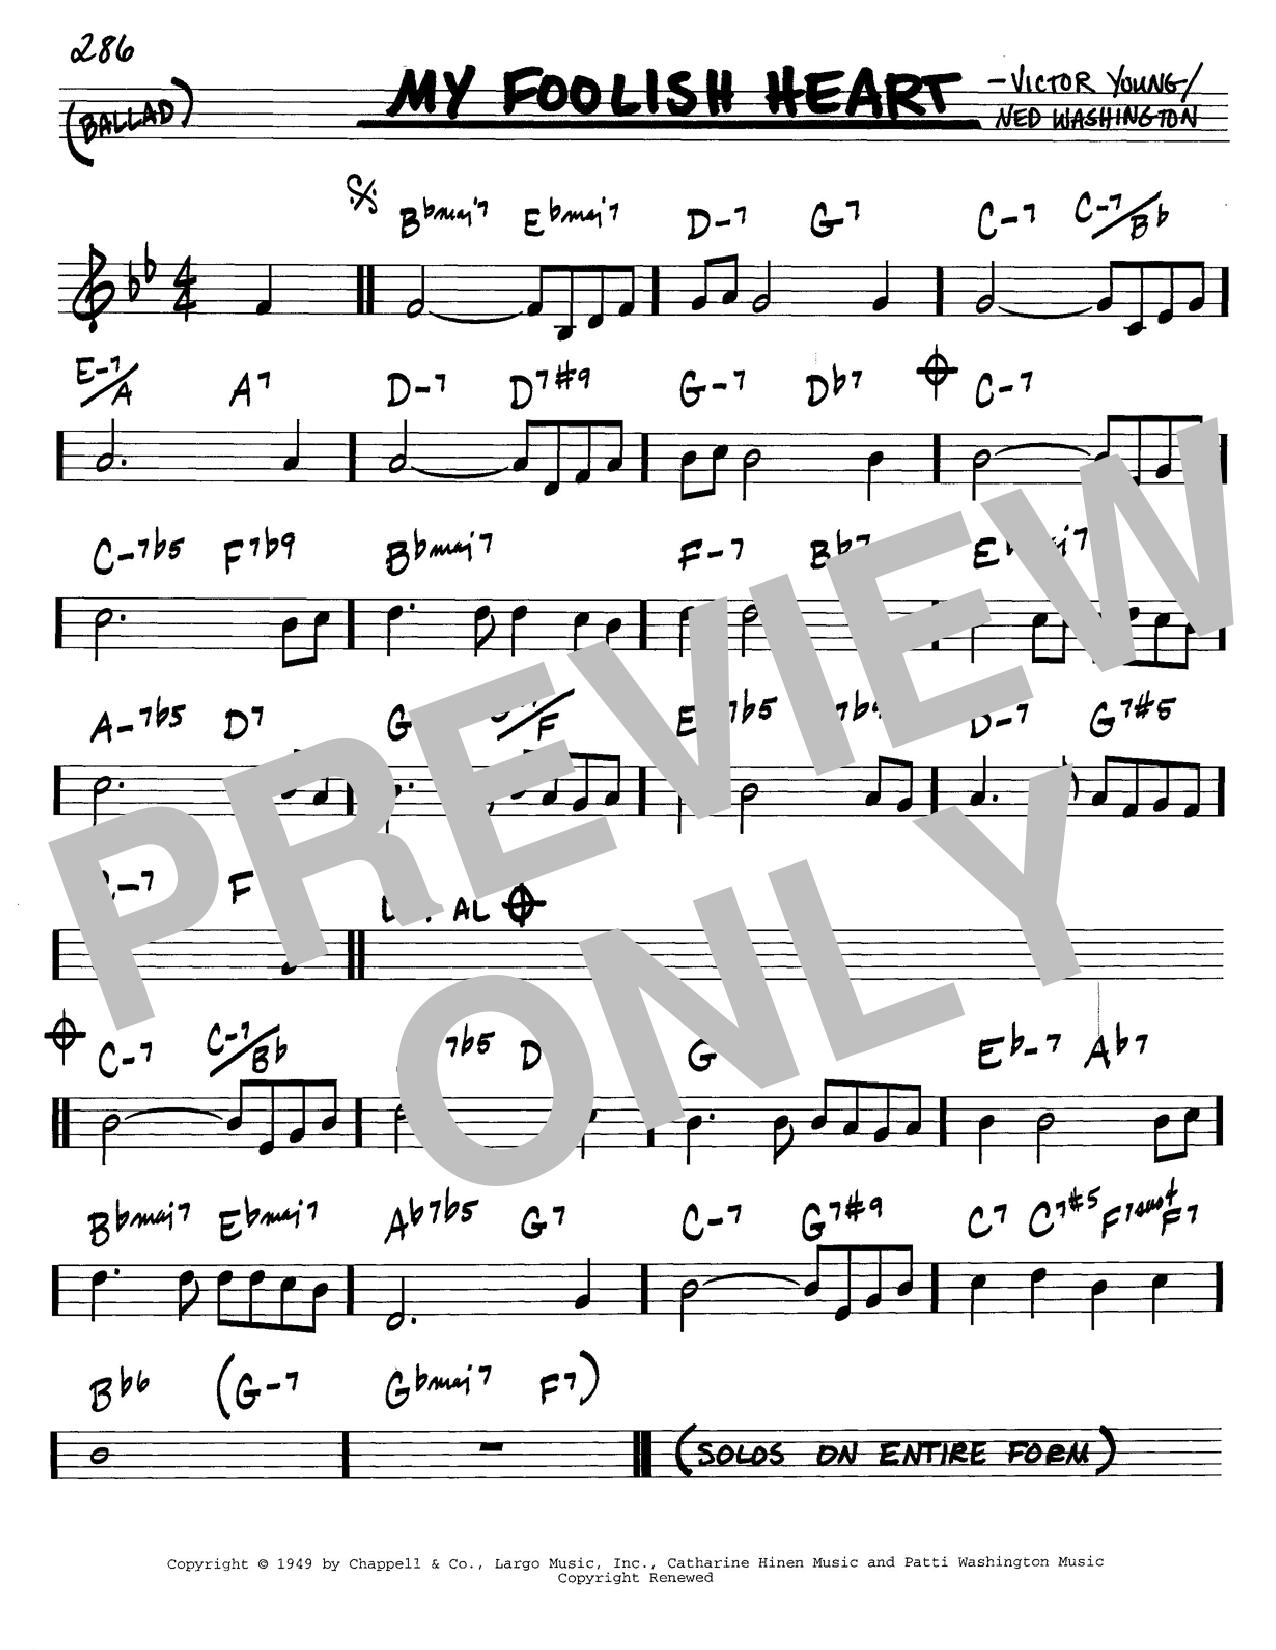 Ned Washington My Foolish Heart sheet music notes and chords